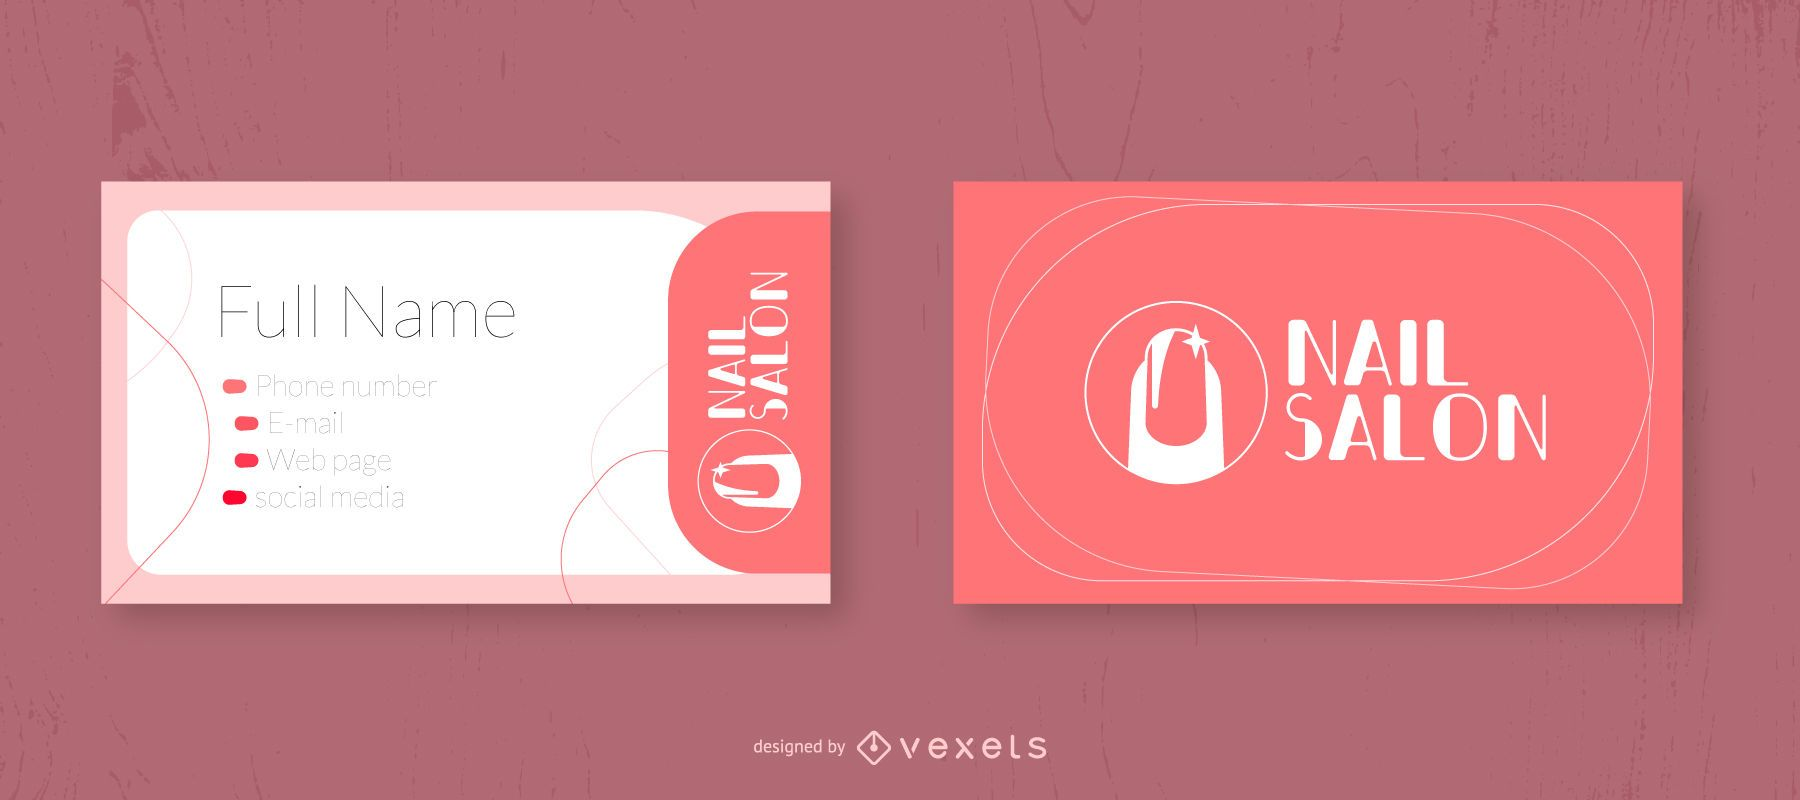 Nail Salon Business Card Design Vector Download